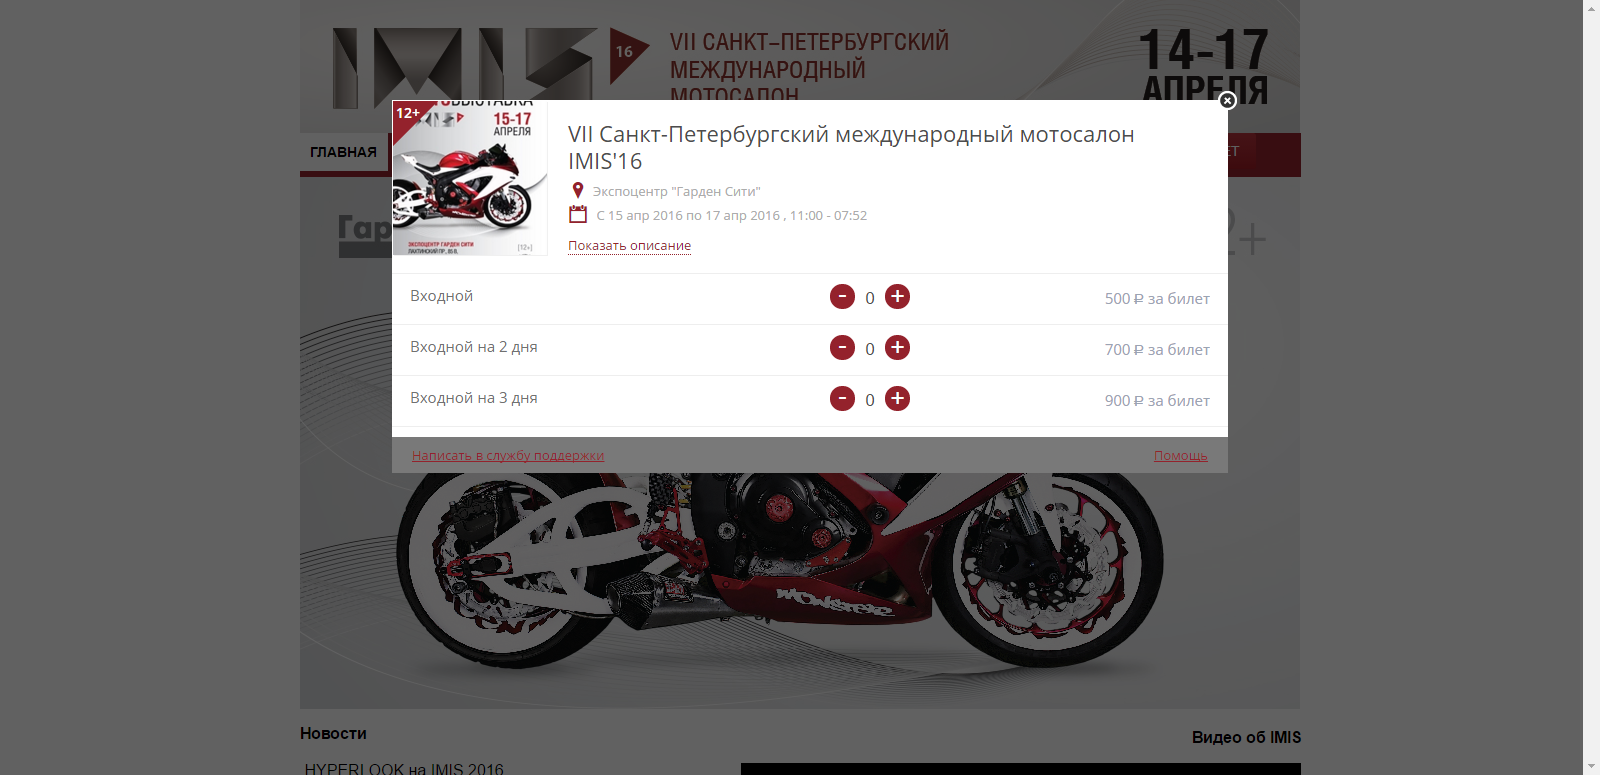 FireShot Capture 39 - IMIS - International motocycle industry salon - http___www.imismoto.ru_